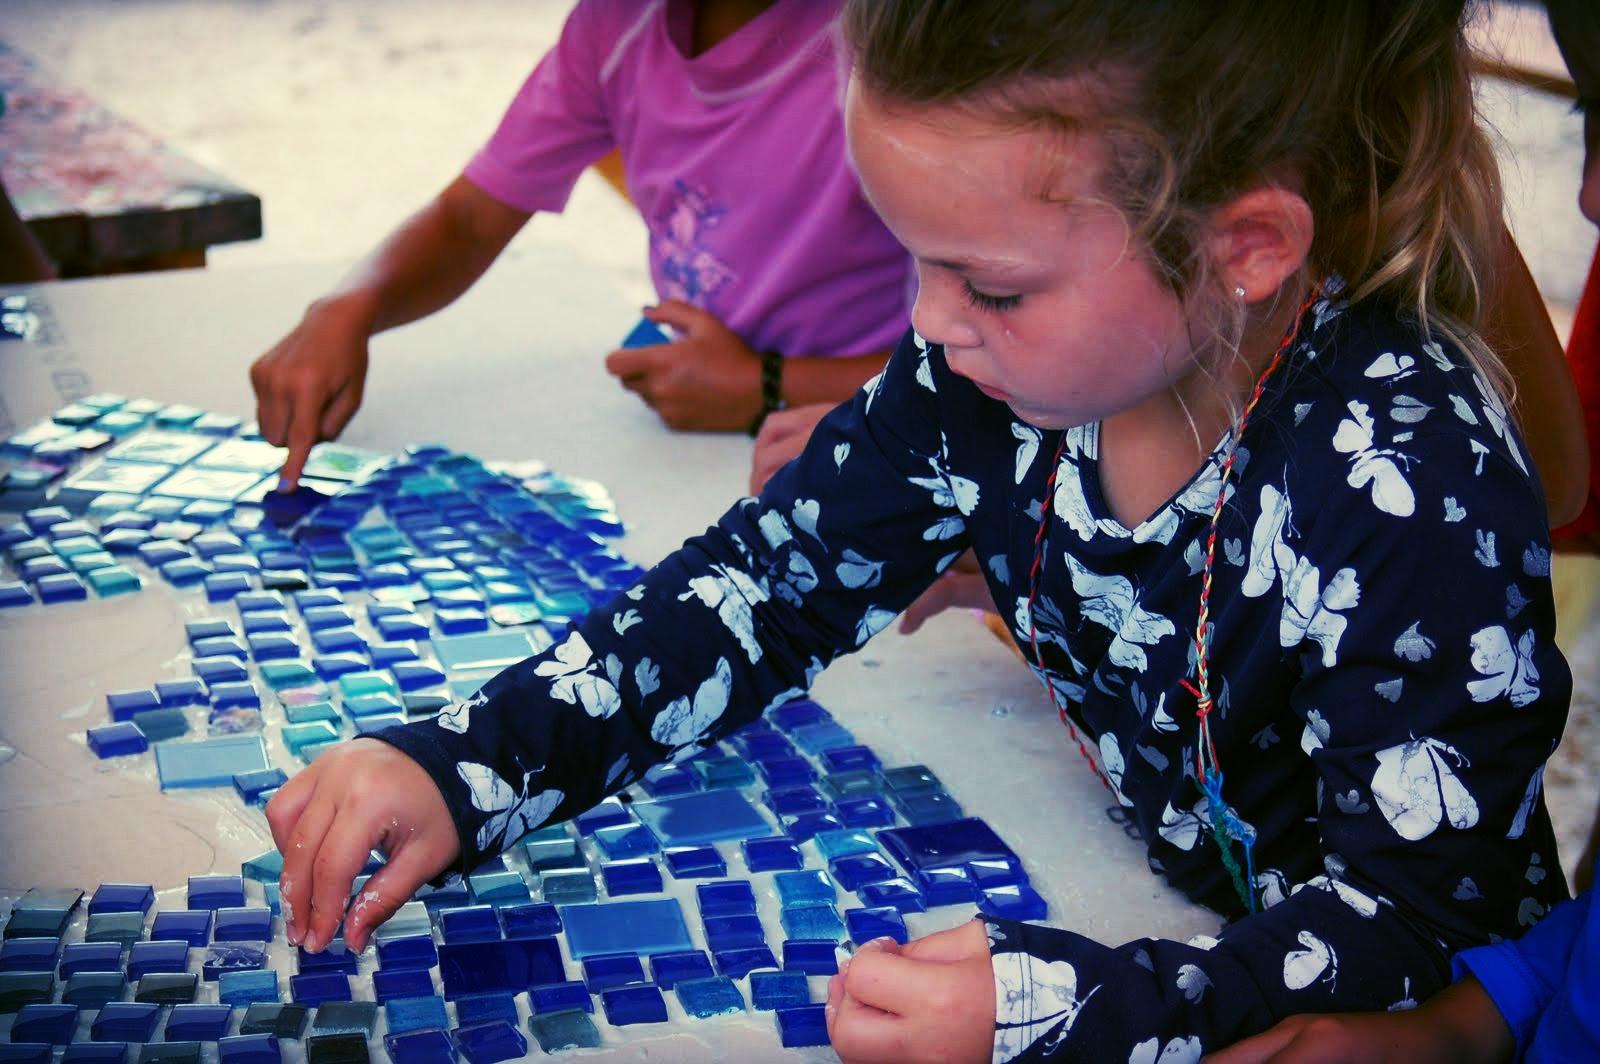 Mosaics are a favorite art form among Sanibel Sea School participants.